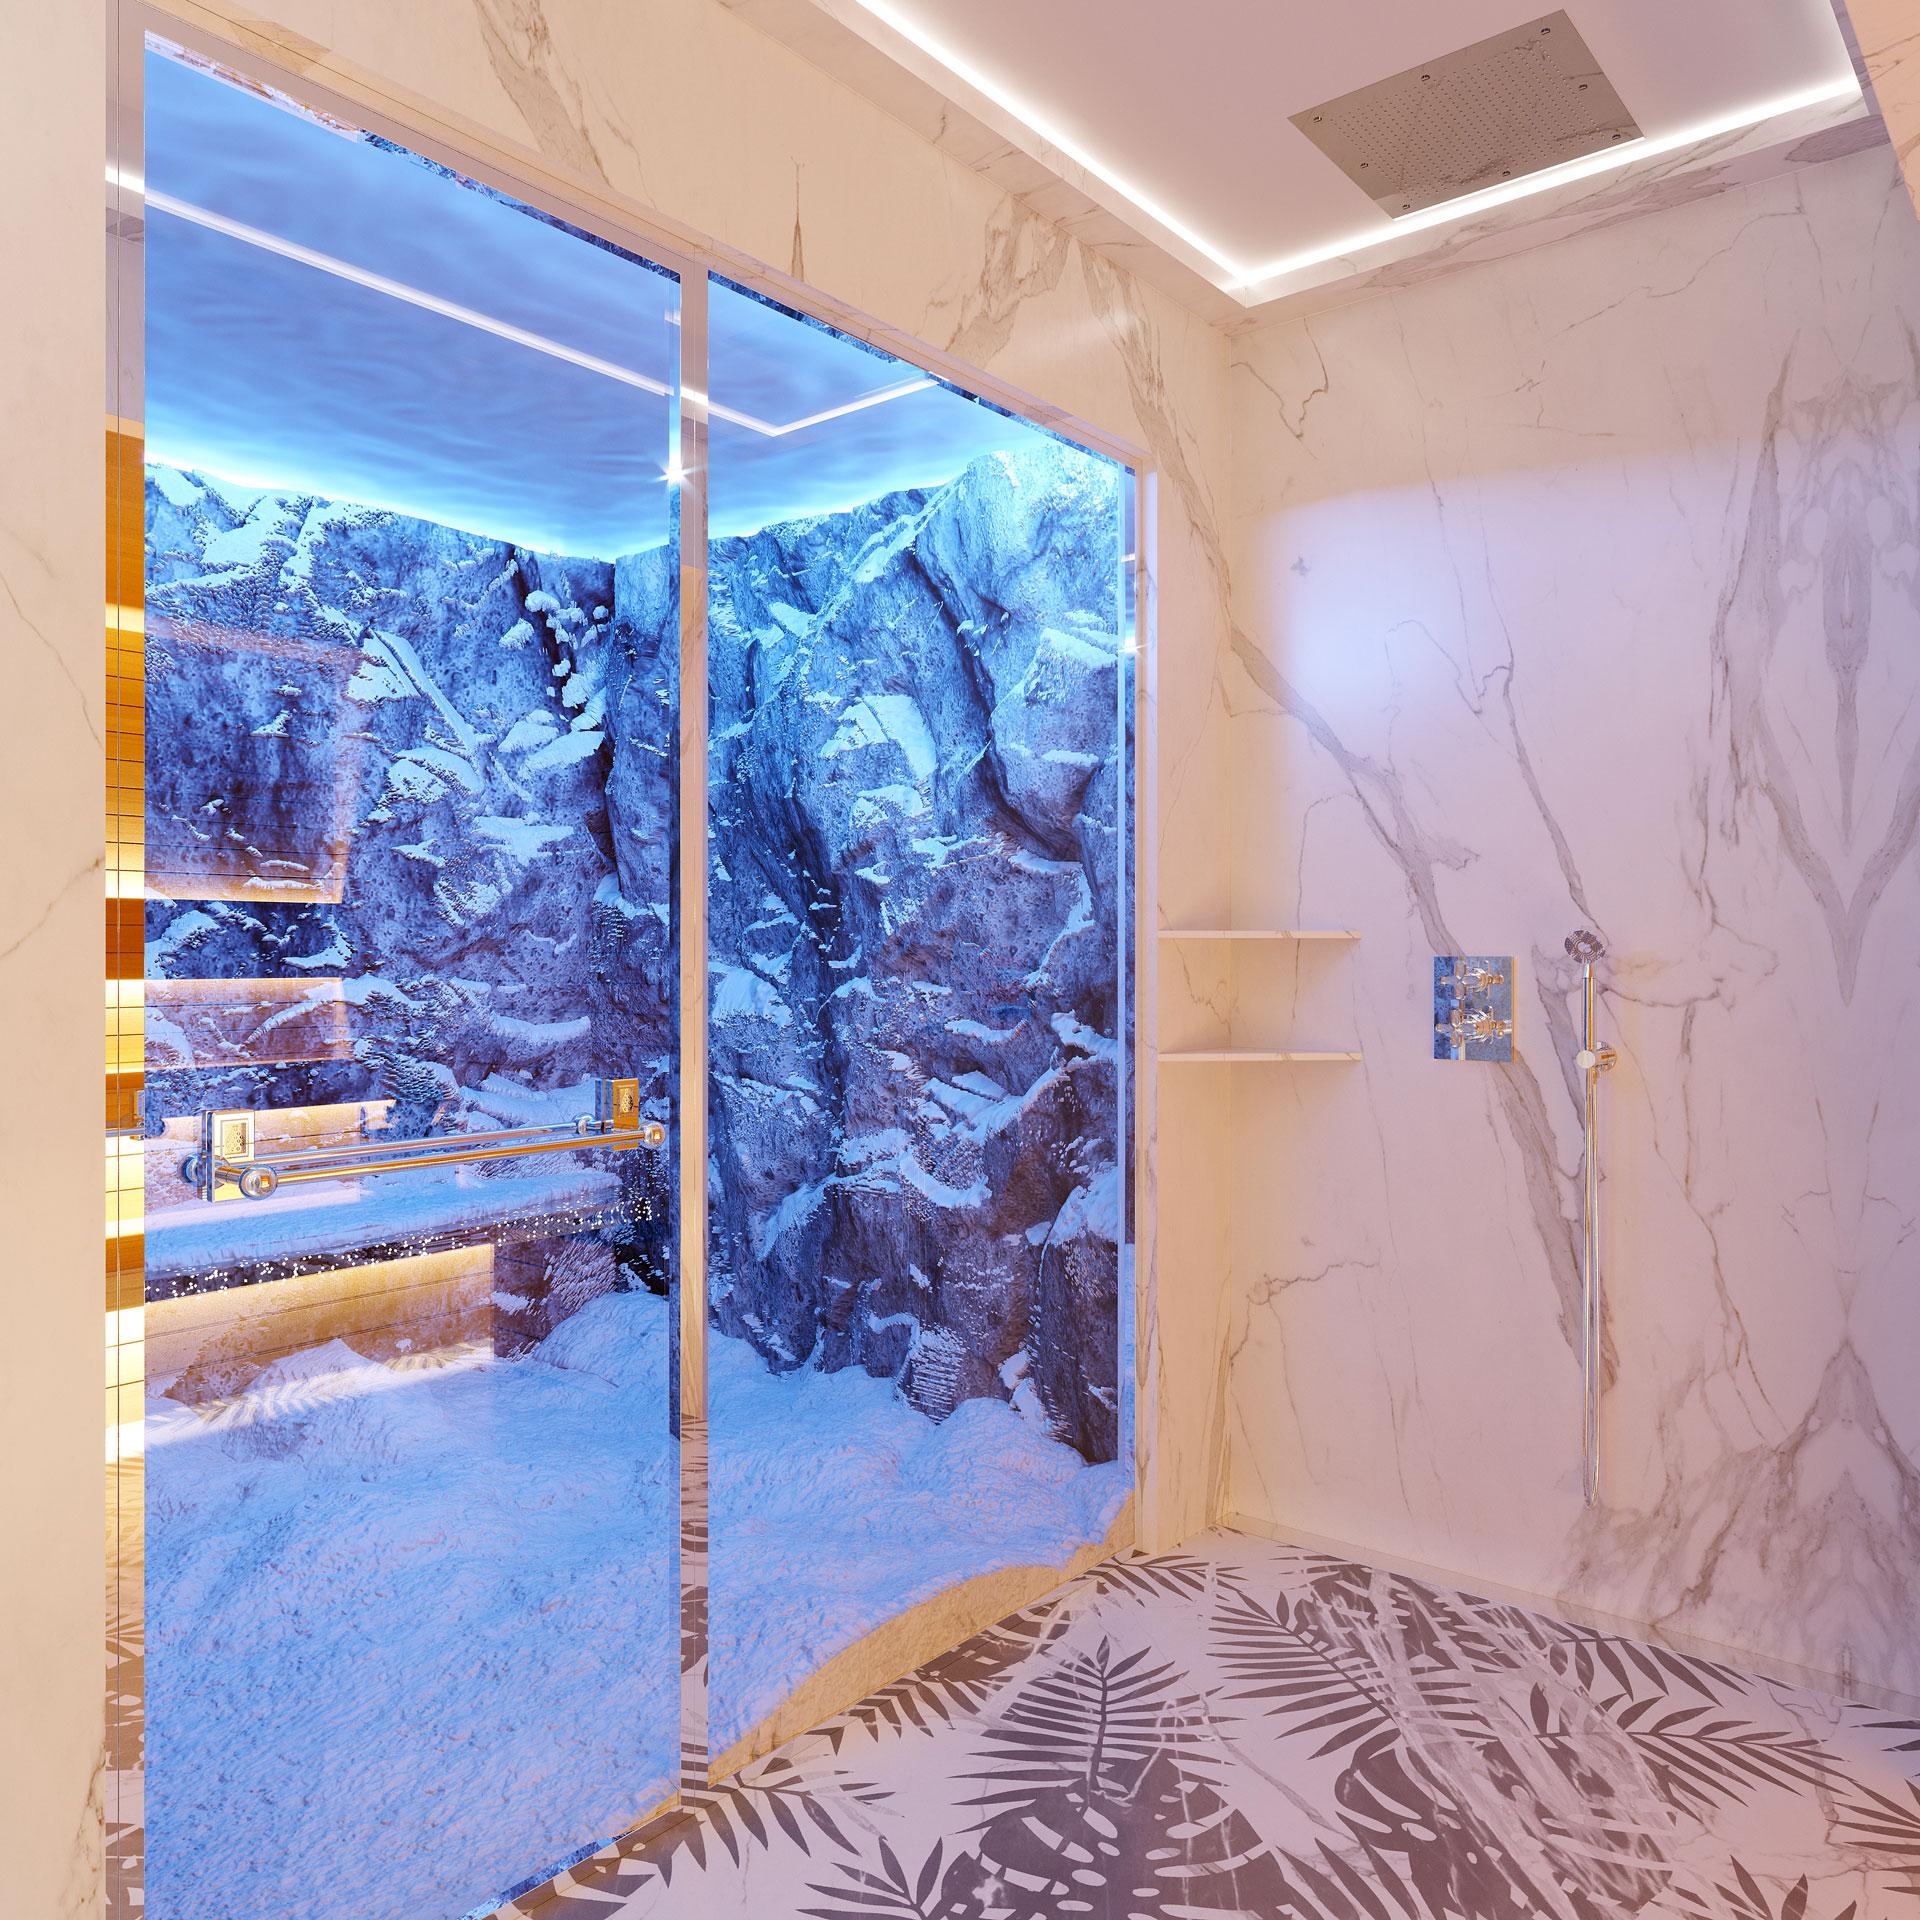 spa Imboulou - Alpes perspectiviste 3D